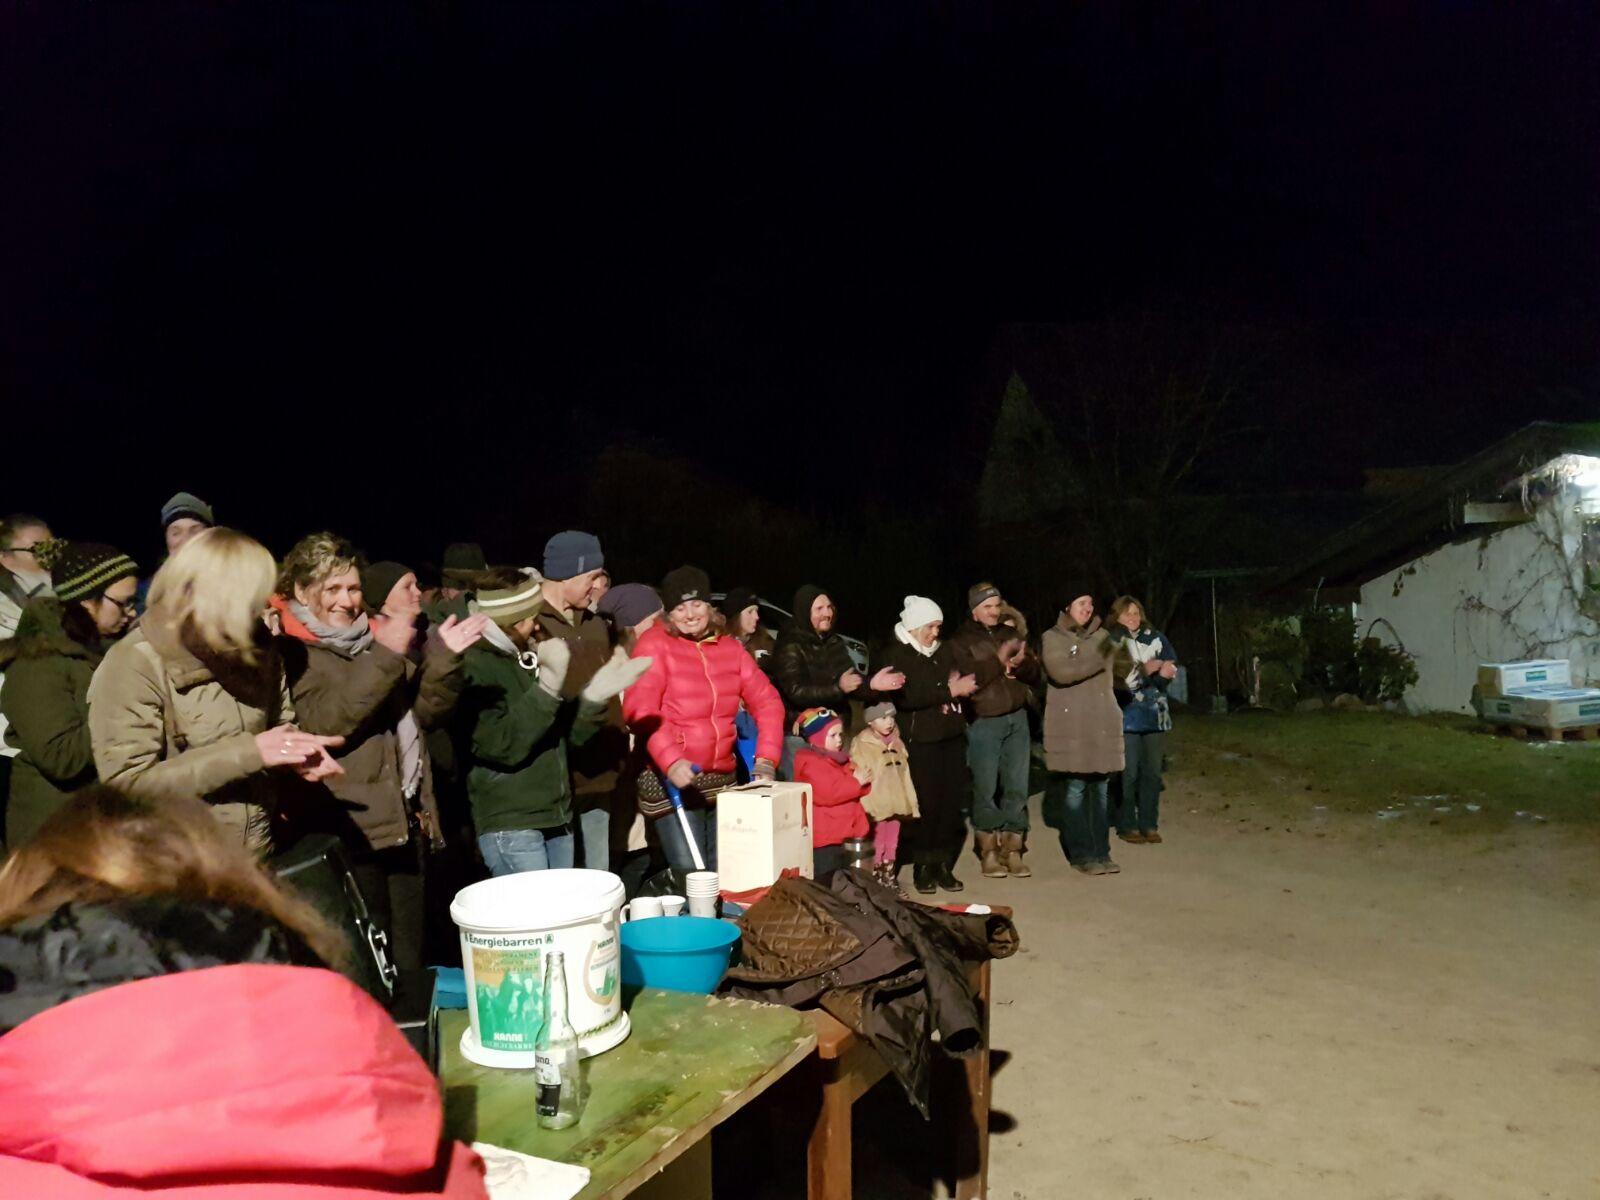 http://www.reitergruppe-roethenbach.de/media/Weihnachtsfeier_bei_Schusters/IMG-20161202-WA0012.jpg